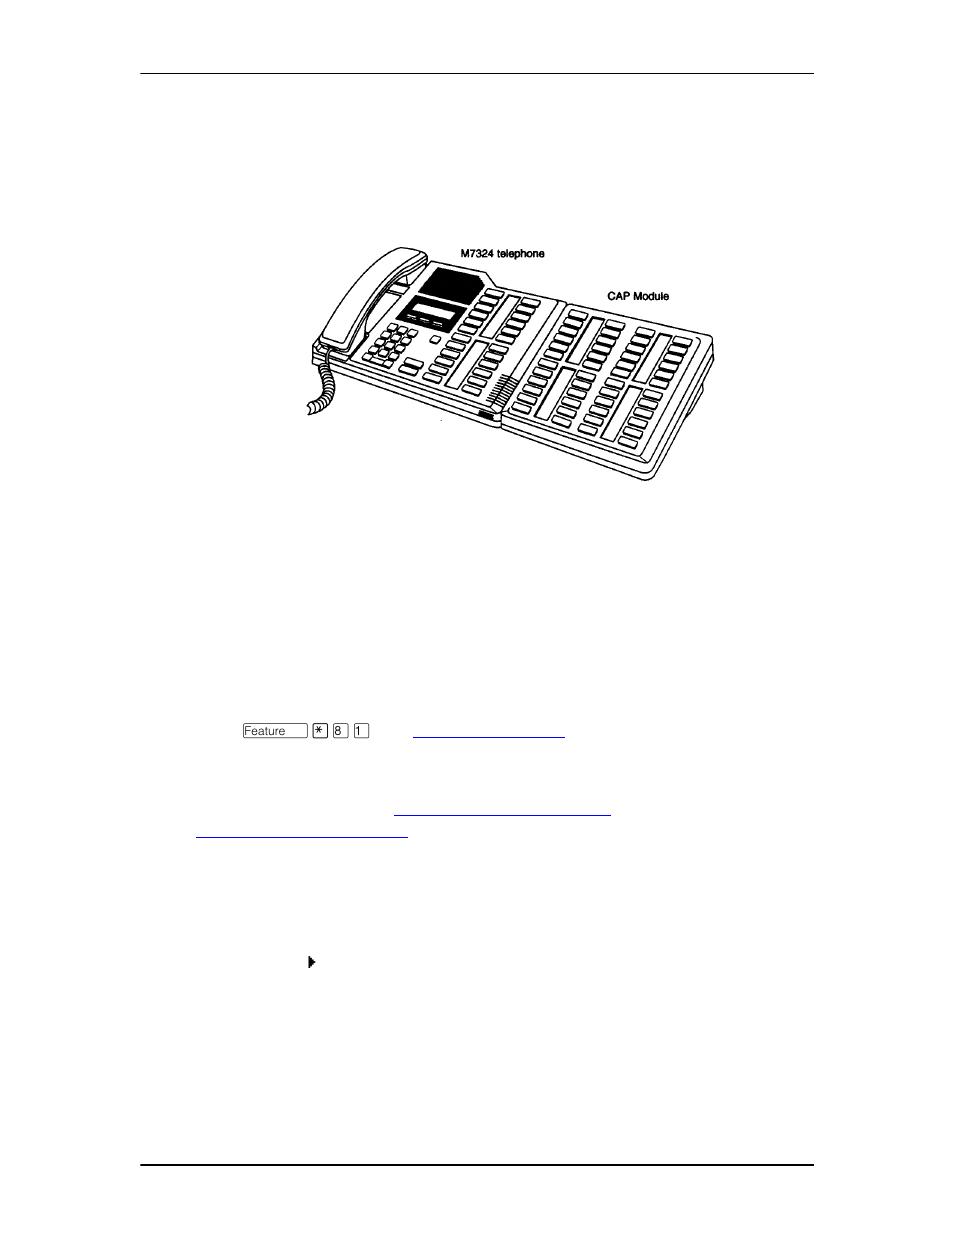 Using a central answering position (cap) module 719818d400d